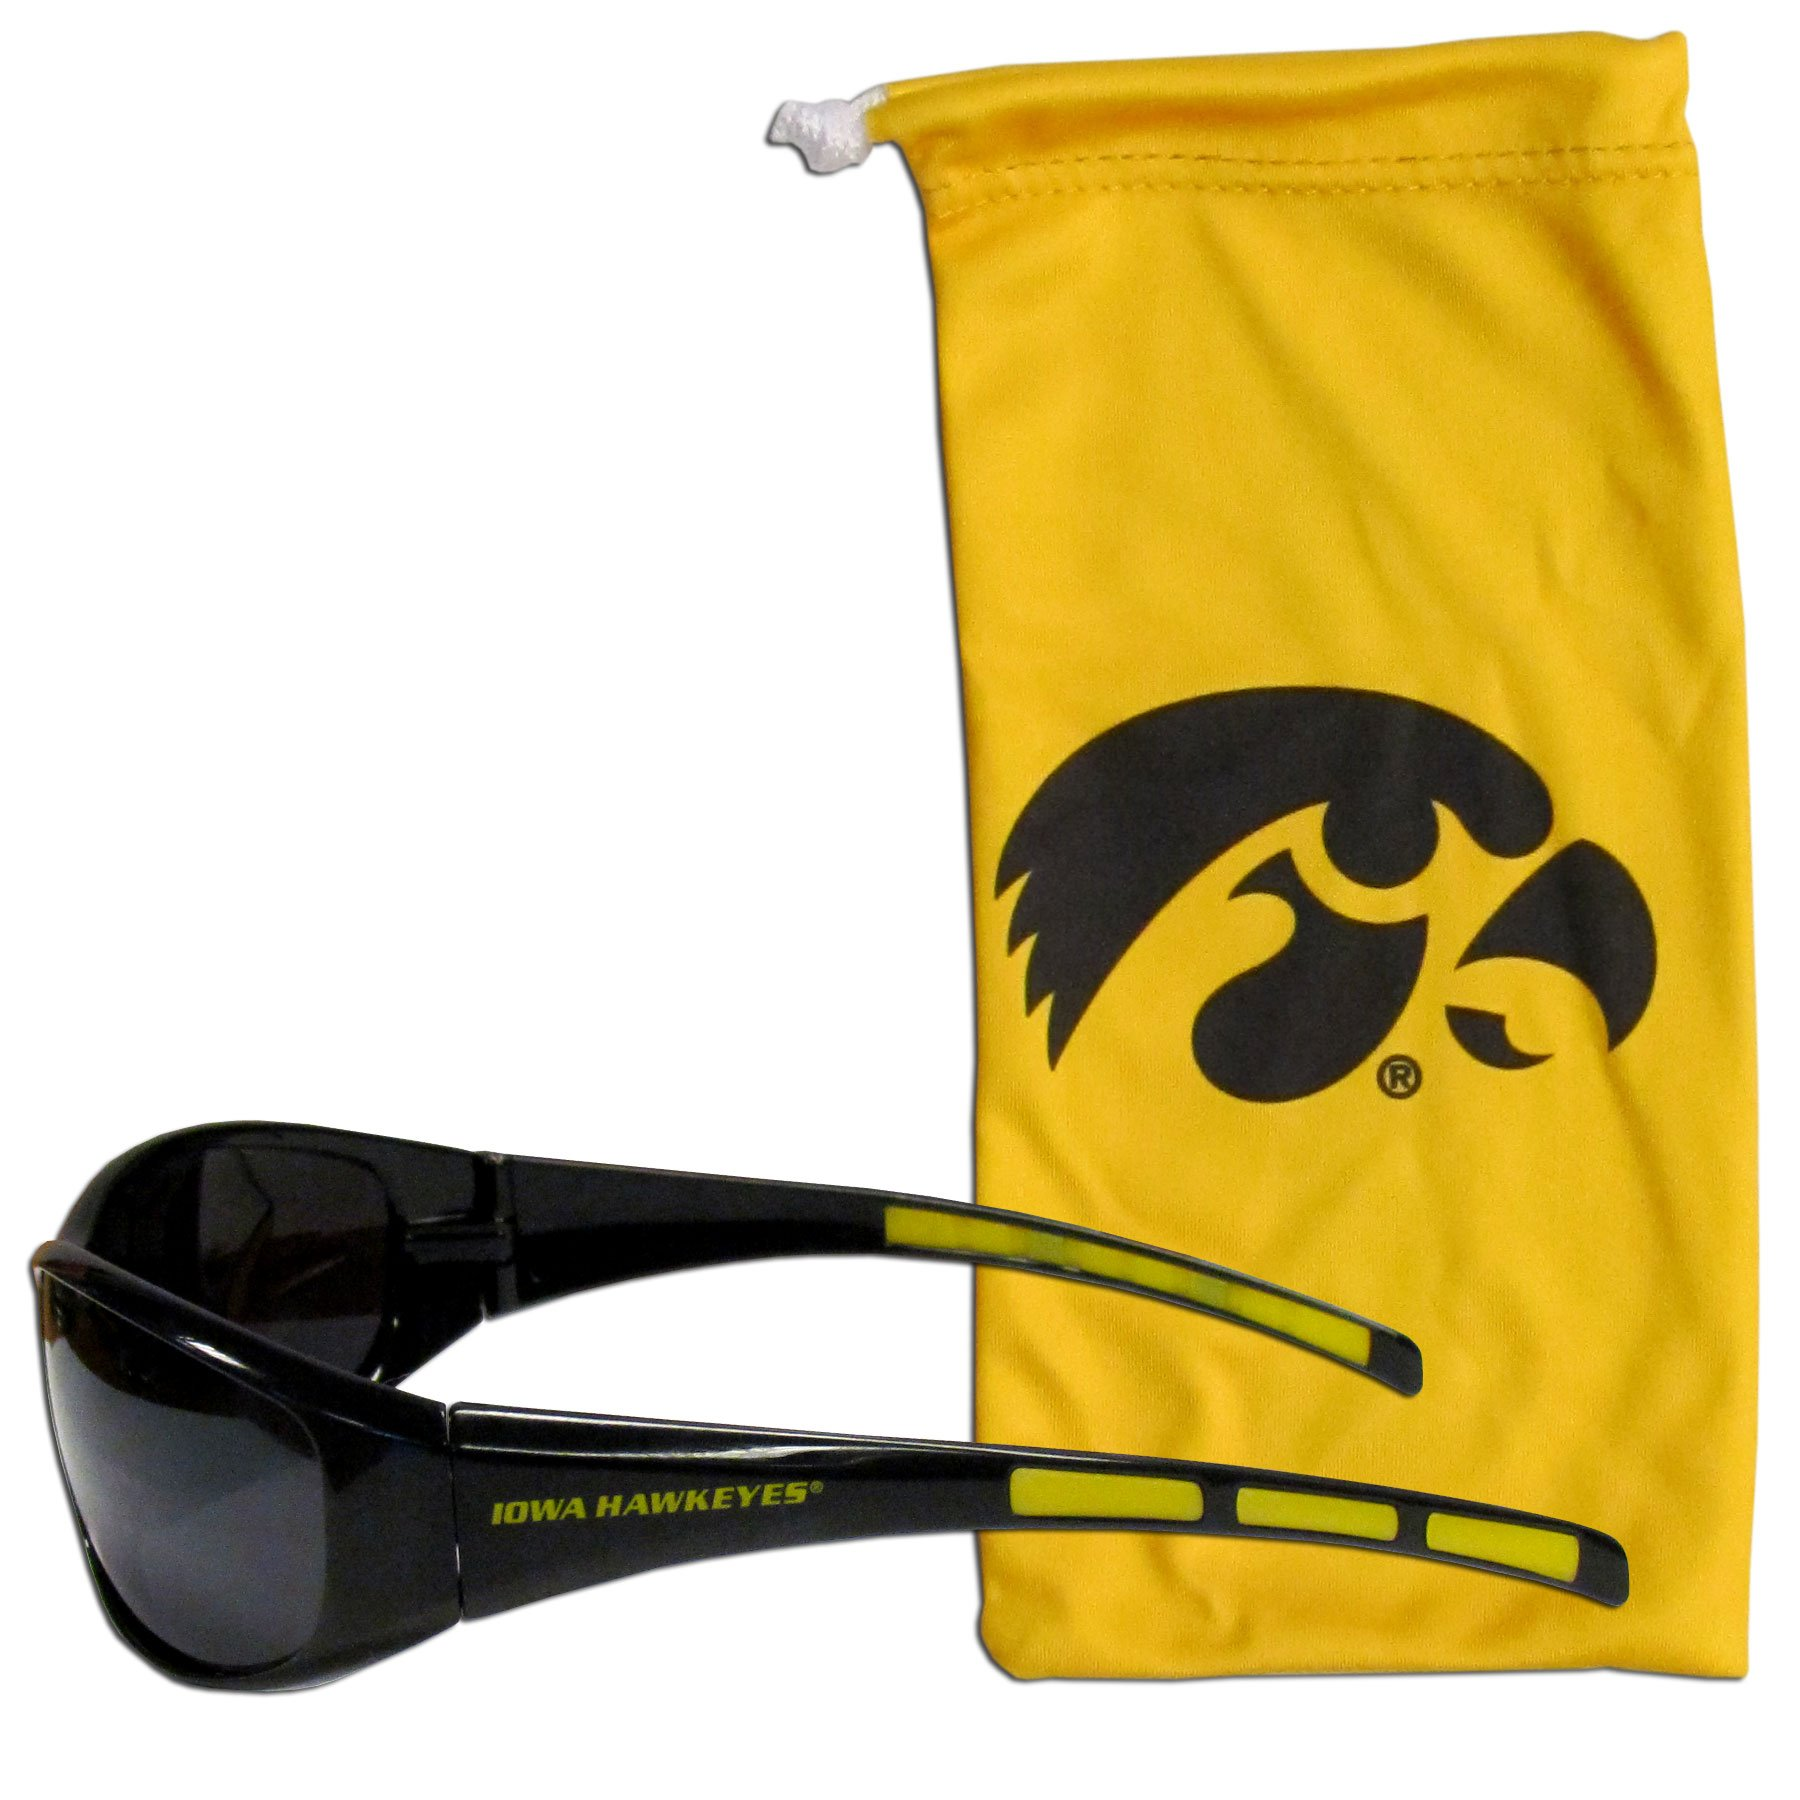 Siskiyou NCAA Iowa Hawkeyes Adult Sunglass and Bag Set, Yellow